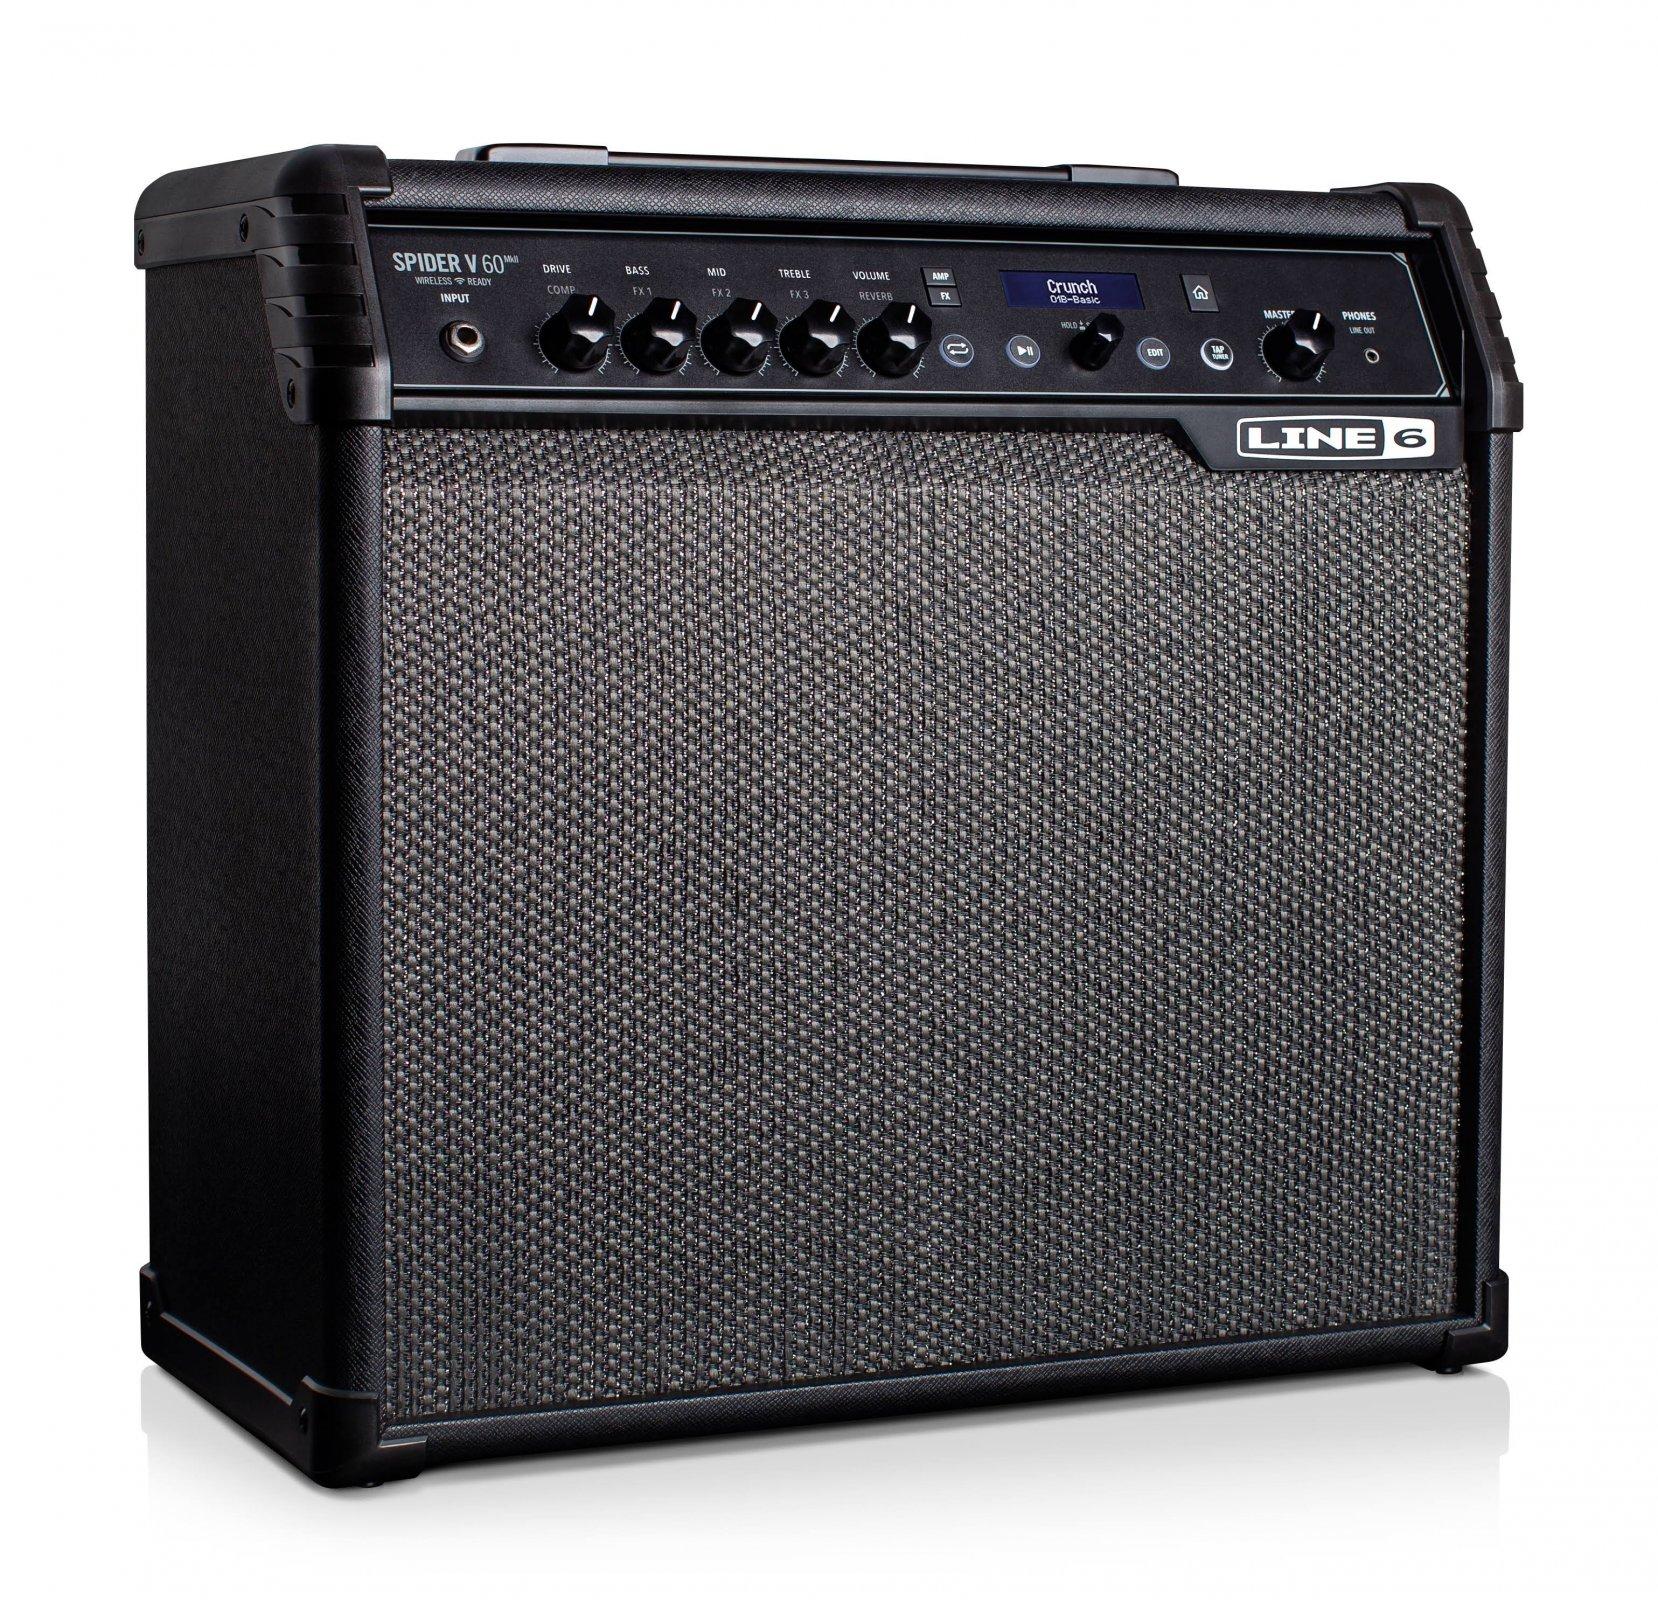 Line 6 Spider V60 MKII 60 Watt Electric Guitar Amplifier